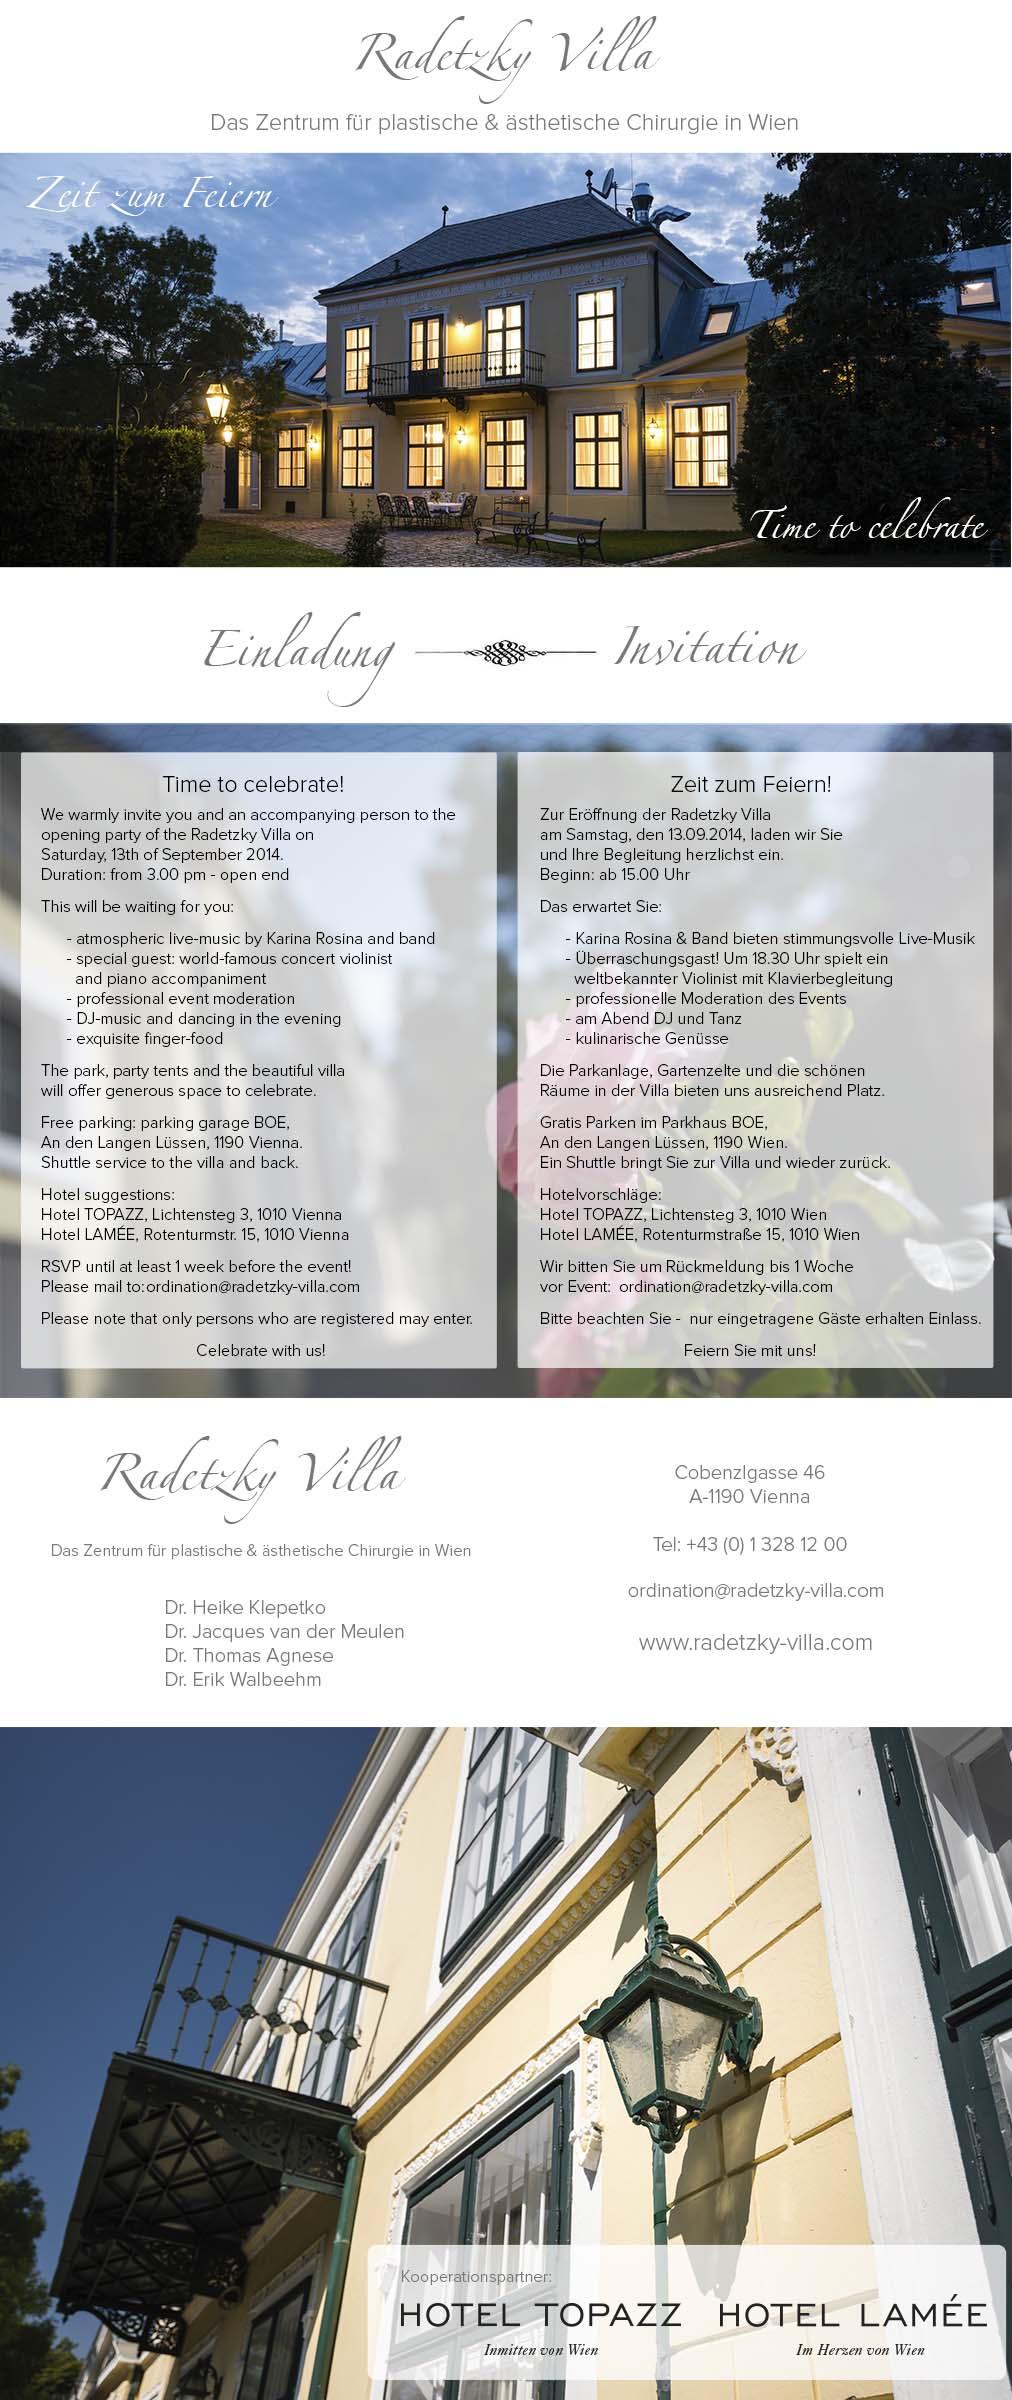 Invitation_Einladung_Radetzky Villa_13.09.2014